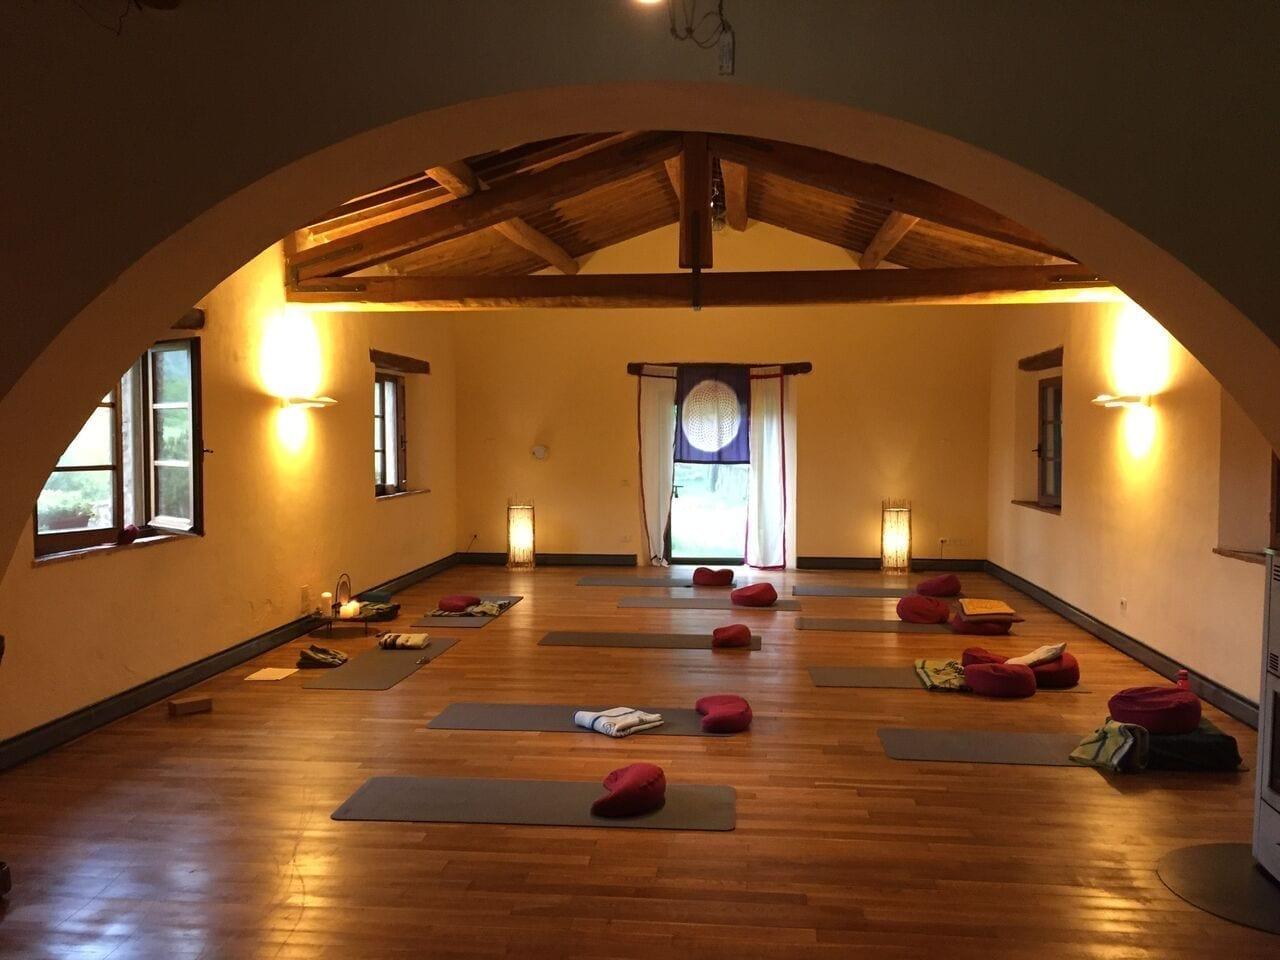 Yoga, Meditation & Breathwork Retreat in Tuscany, Italy 25th May – 9th June